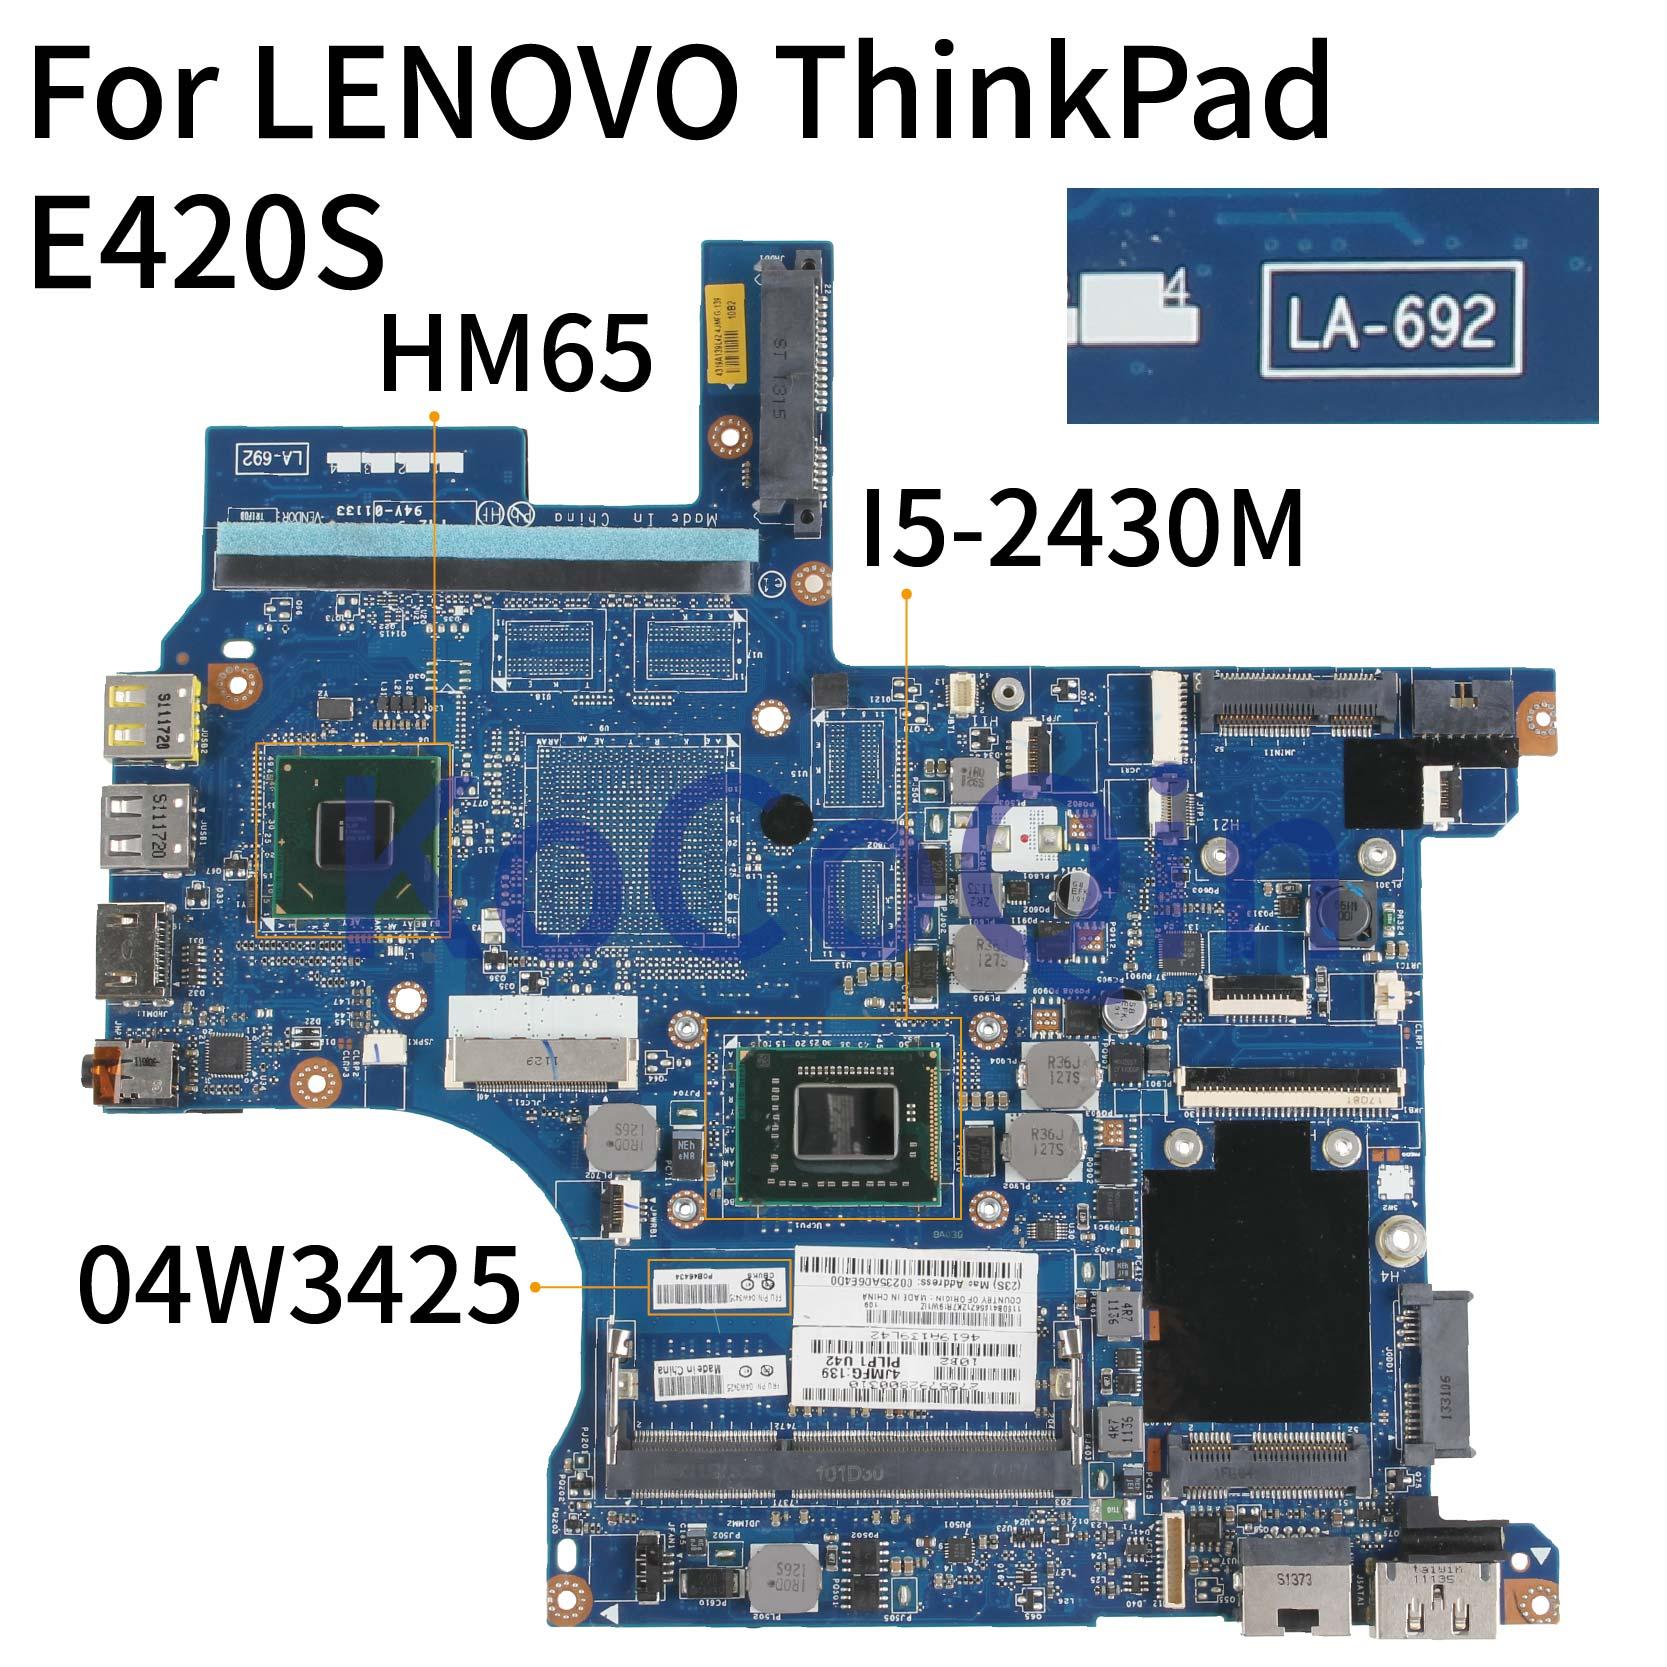 KoCoQin Laptop motherboard For LENOVO ThinkPad E420S I5-2430M  Mainboard 04W3425 04W6502 SR072 HM65